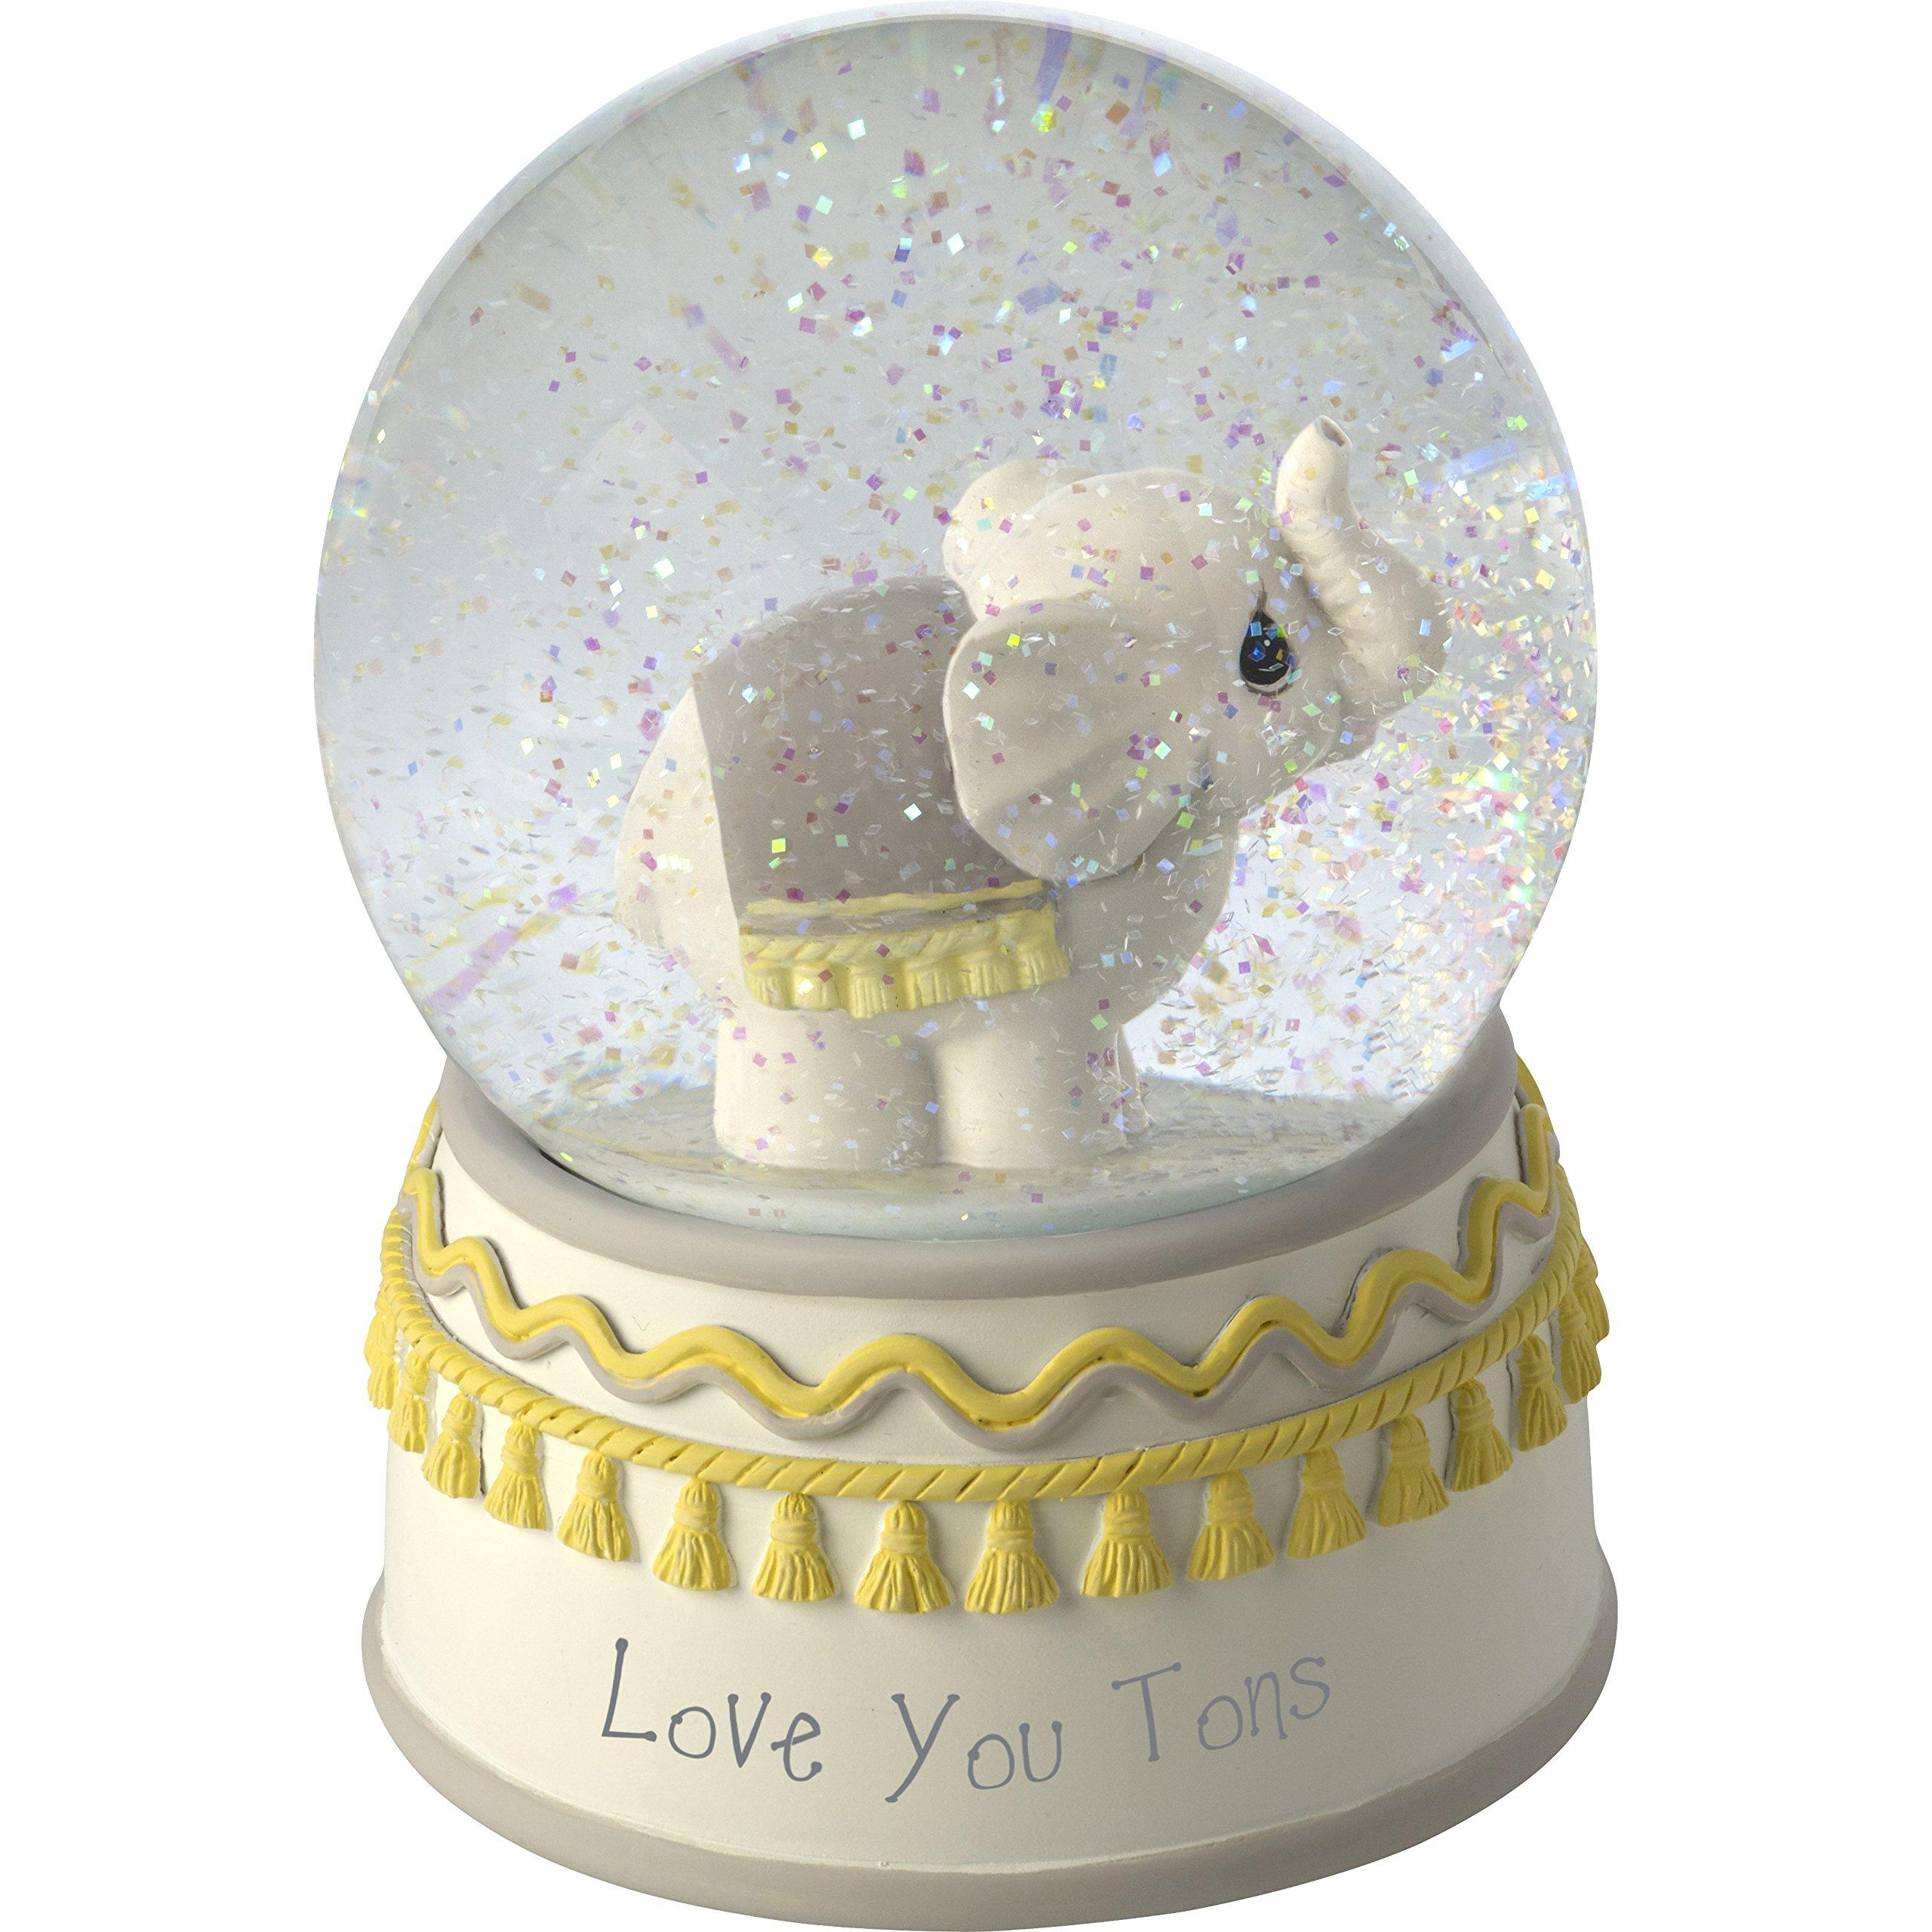 Image of Cute Musical Elephant Water Globe